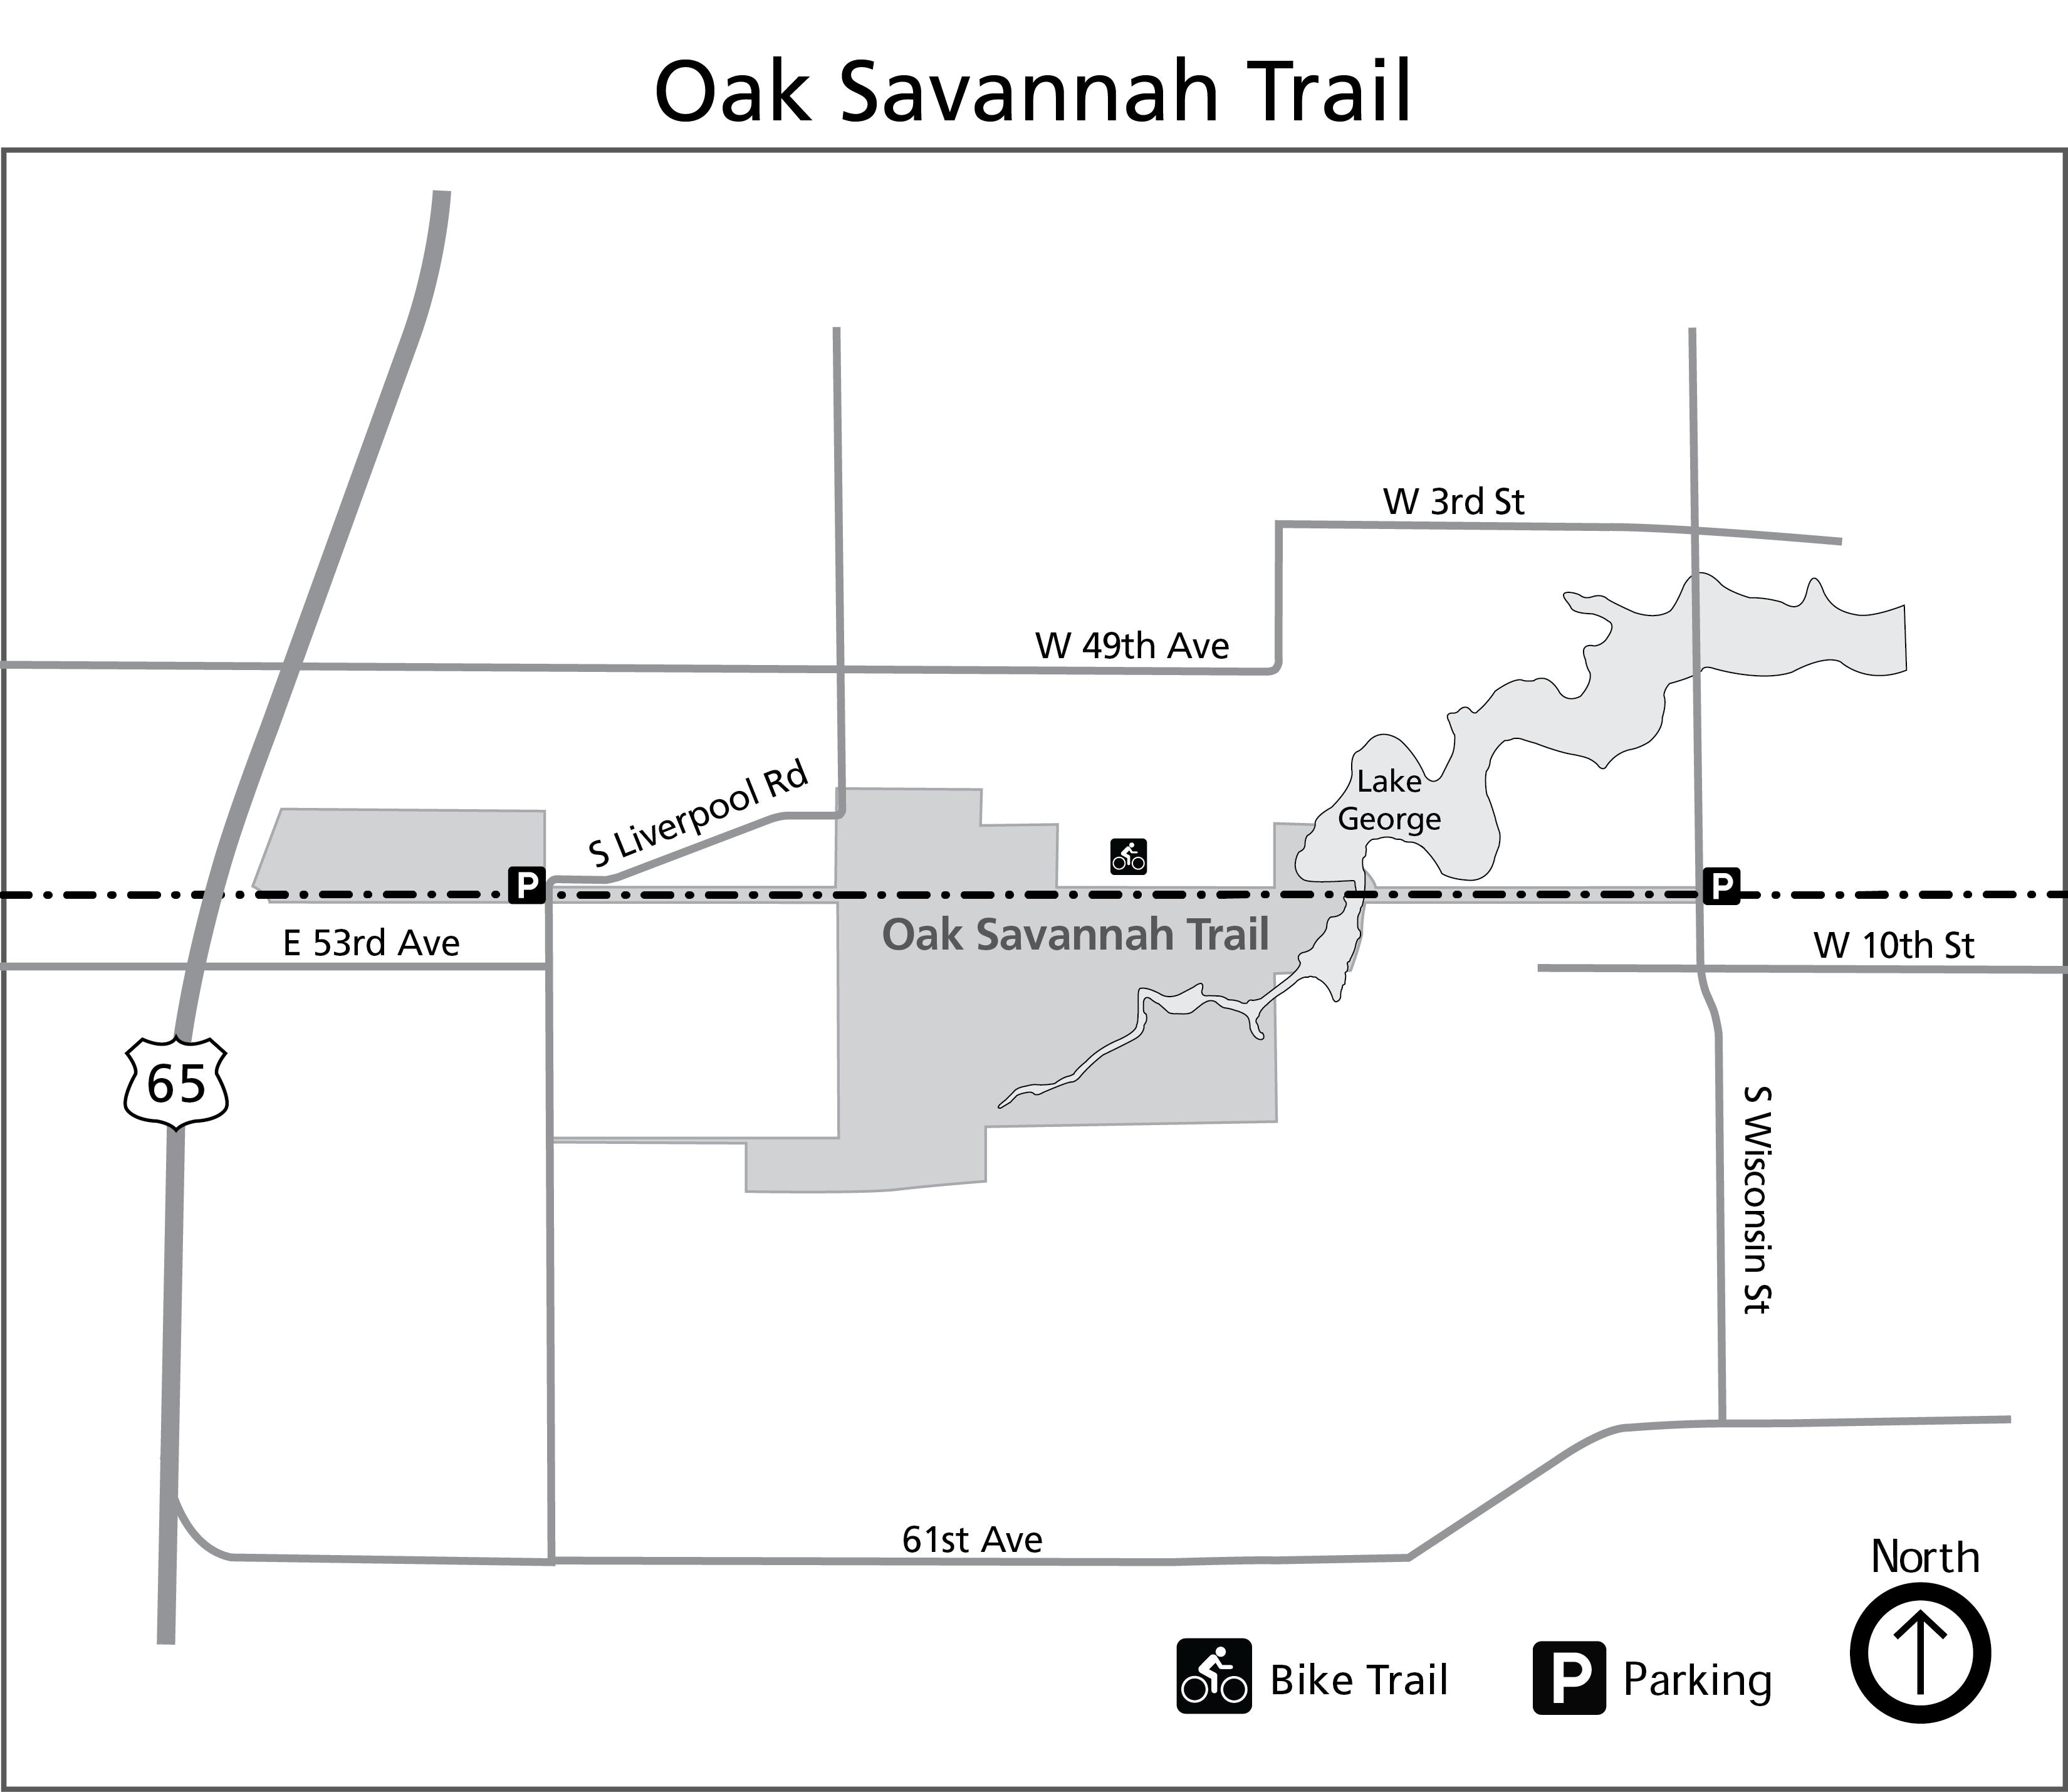 Oak Savannah Trail - Indiana Dunes National Park (U S